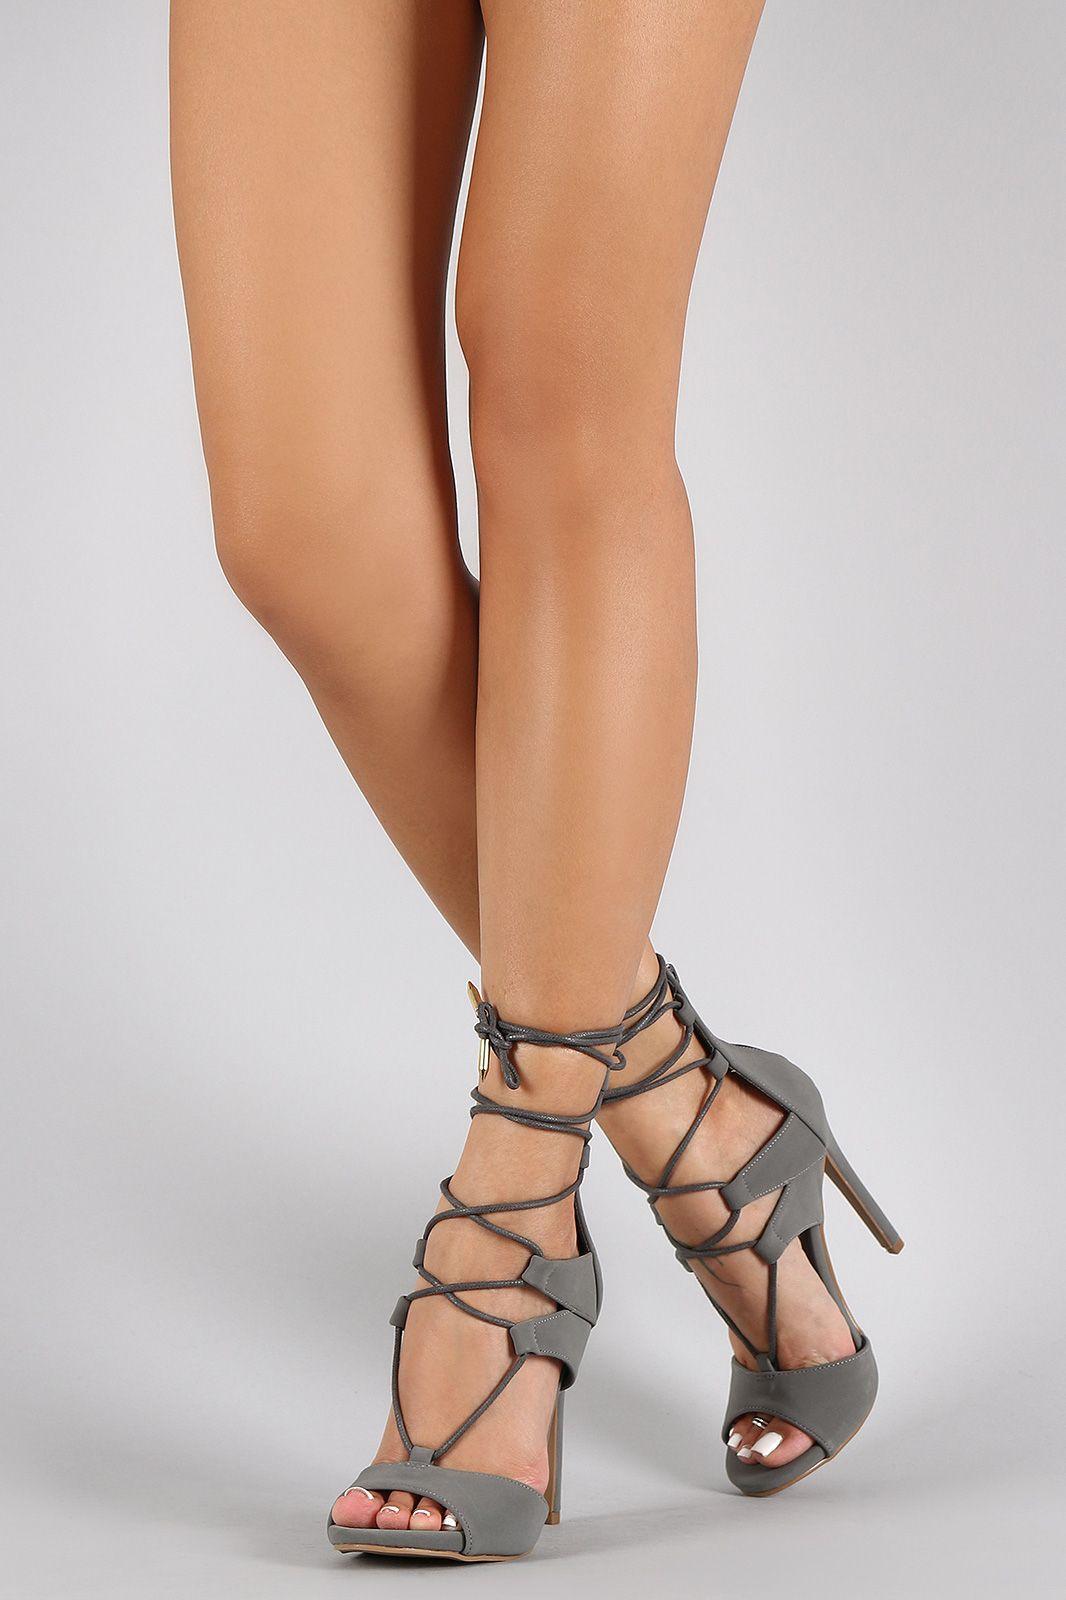 1617558c24 Shoe Republic LA Corset Lace Up Peep Toe Heel